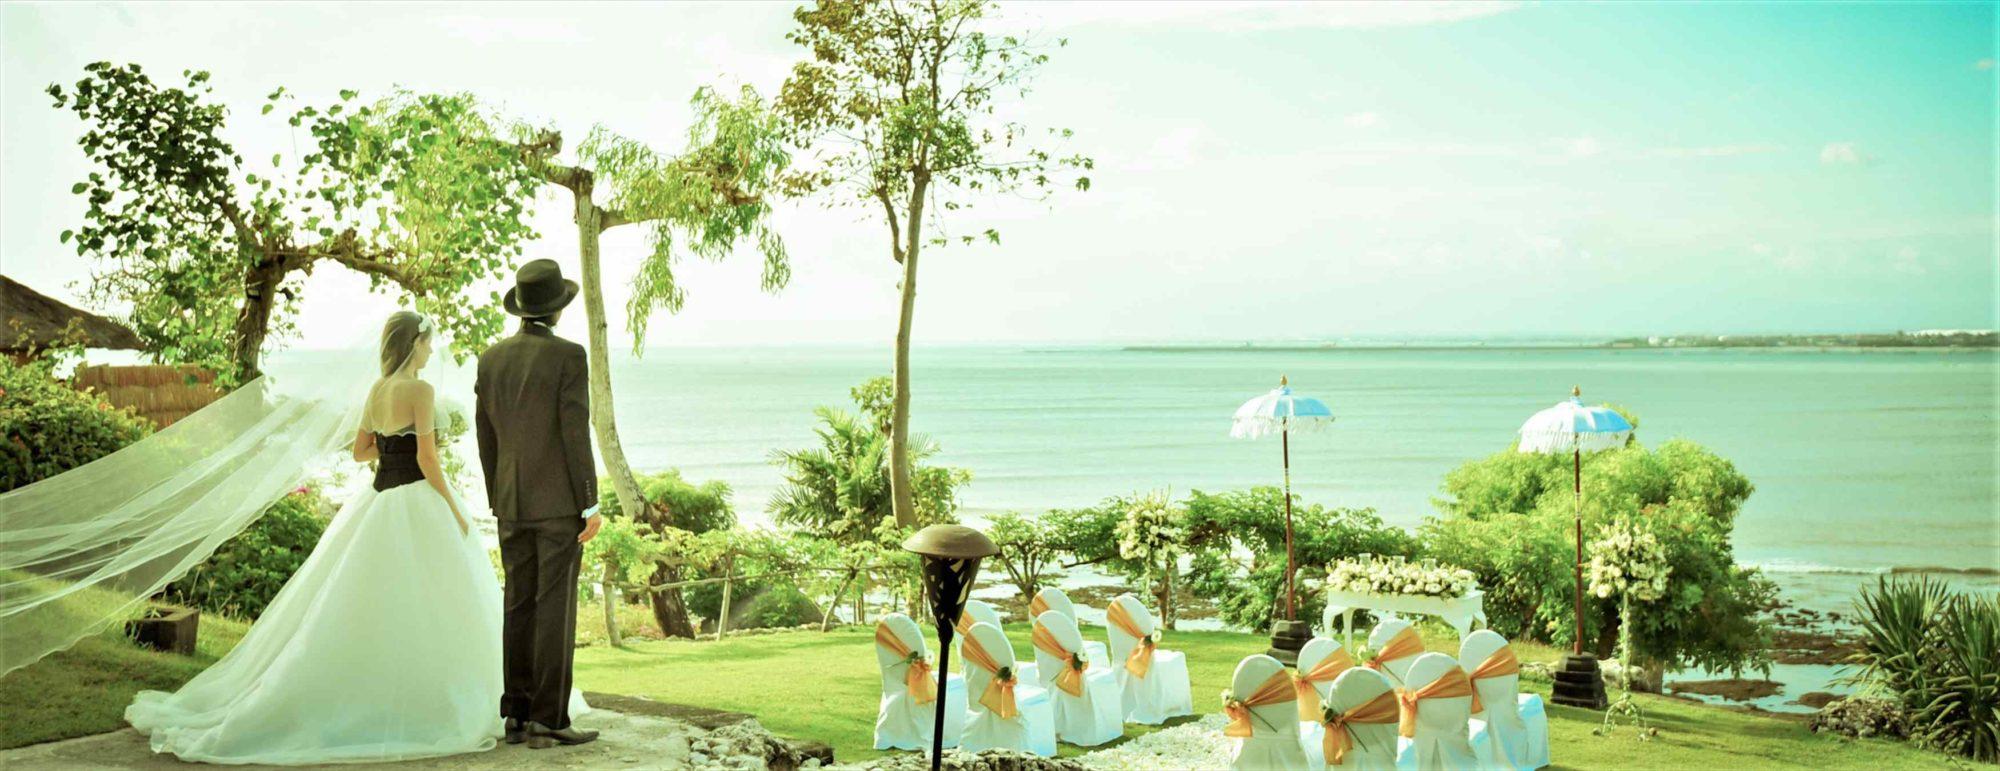 Fourseasons Resort Bali at Jimbaran Bay<br /> フォーシズンズ・リゾート・バリ・アット・ジンバラン・ベイ